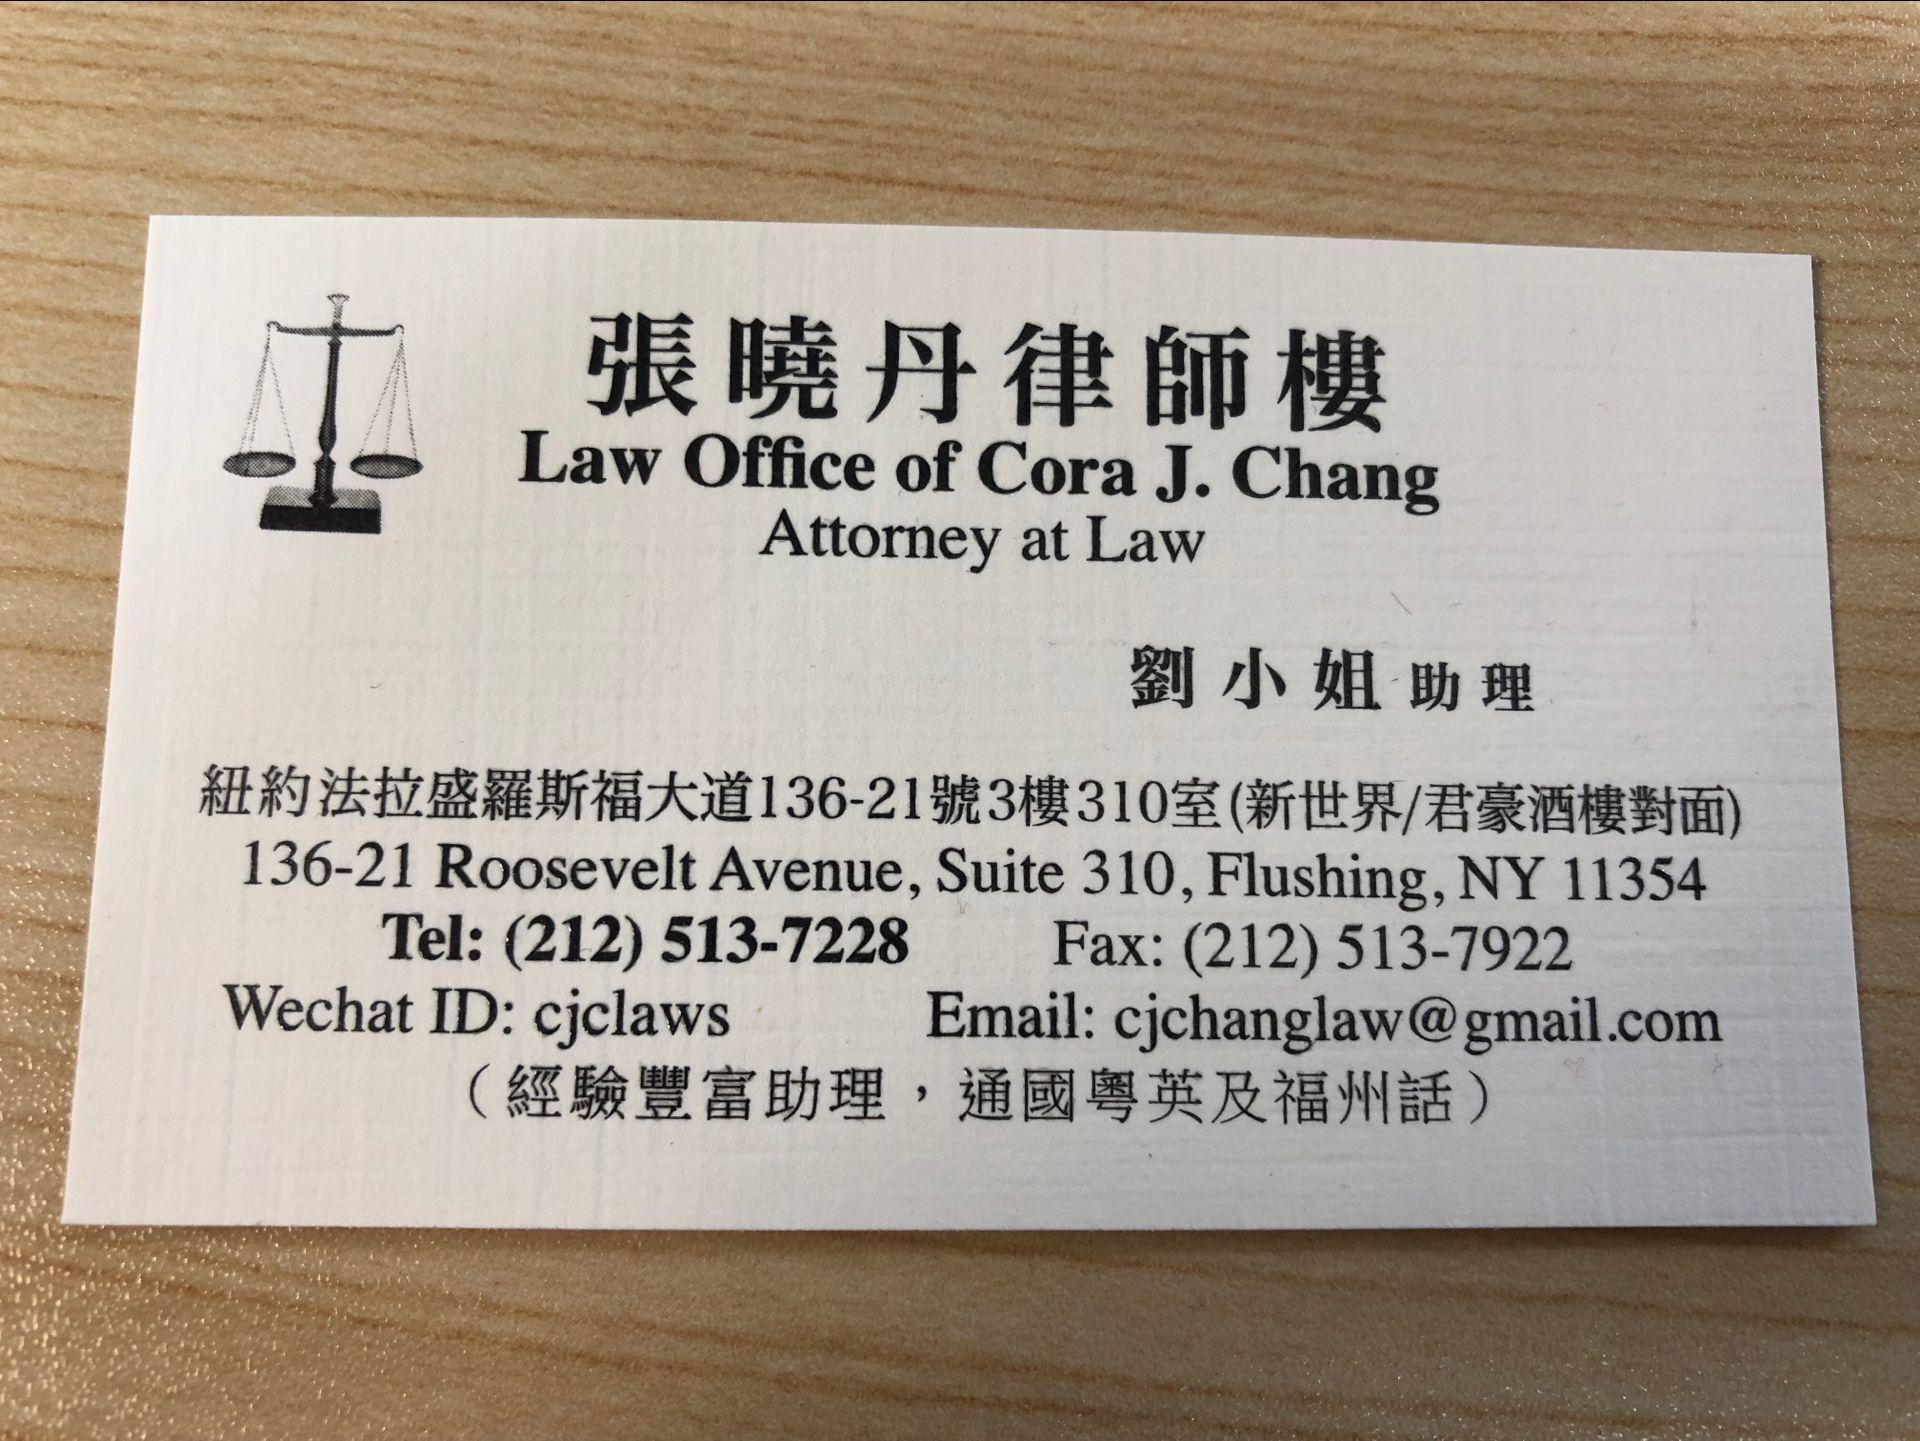 张晓丹律师楼(法拉盛) - Law Office Of Chang, Cora J.